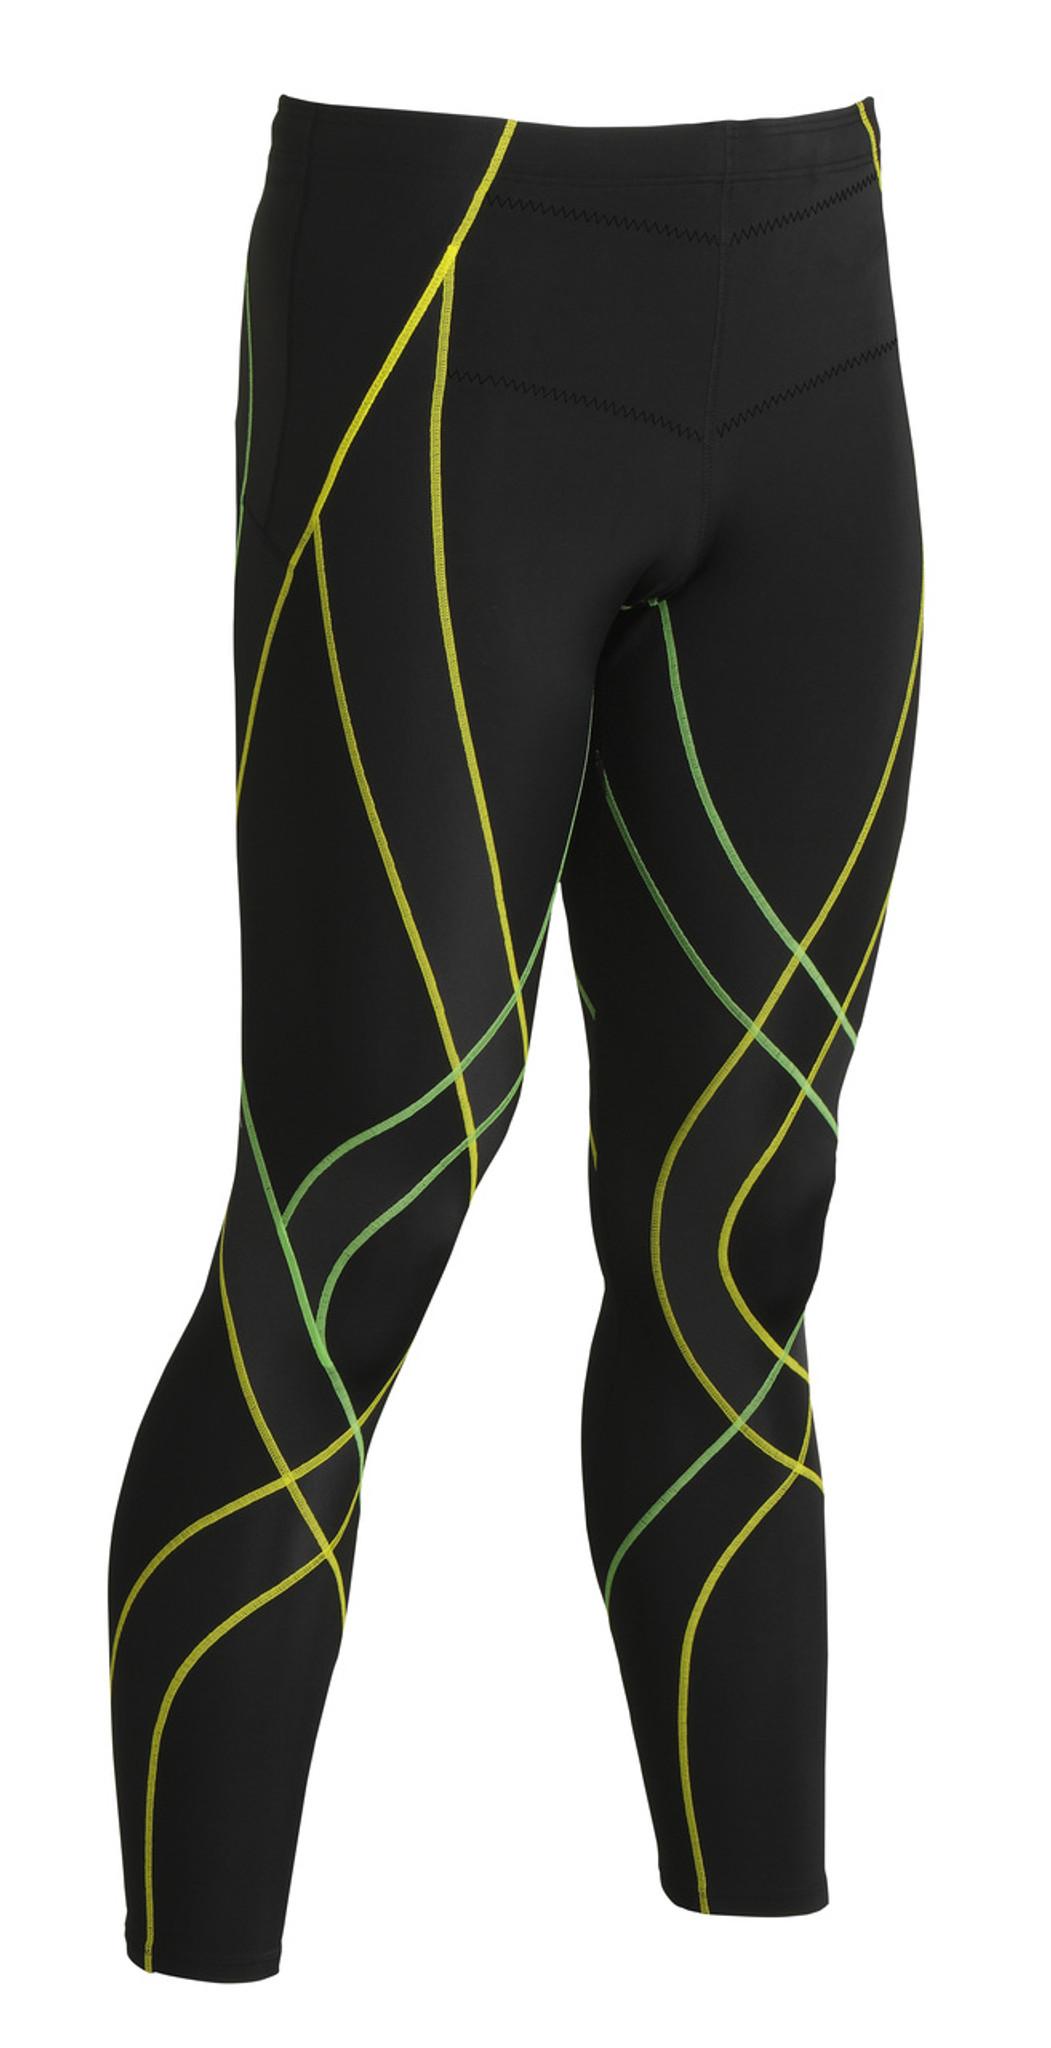 29cd10837bf301 Home · Run · CW-X Mens Endurance Generator Tights 229809 · Black / Green /  Yellow - Front